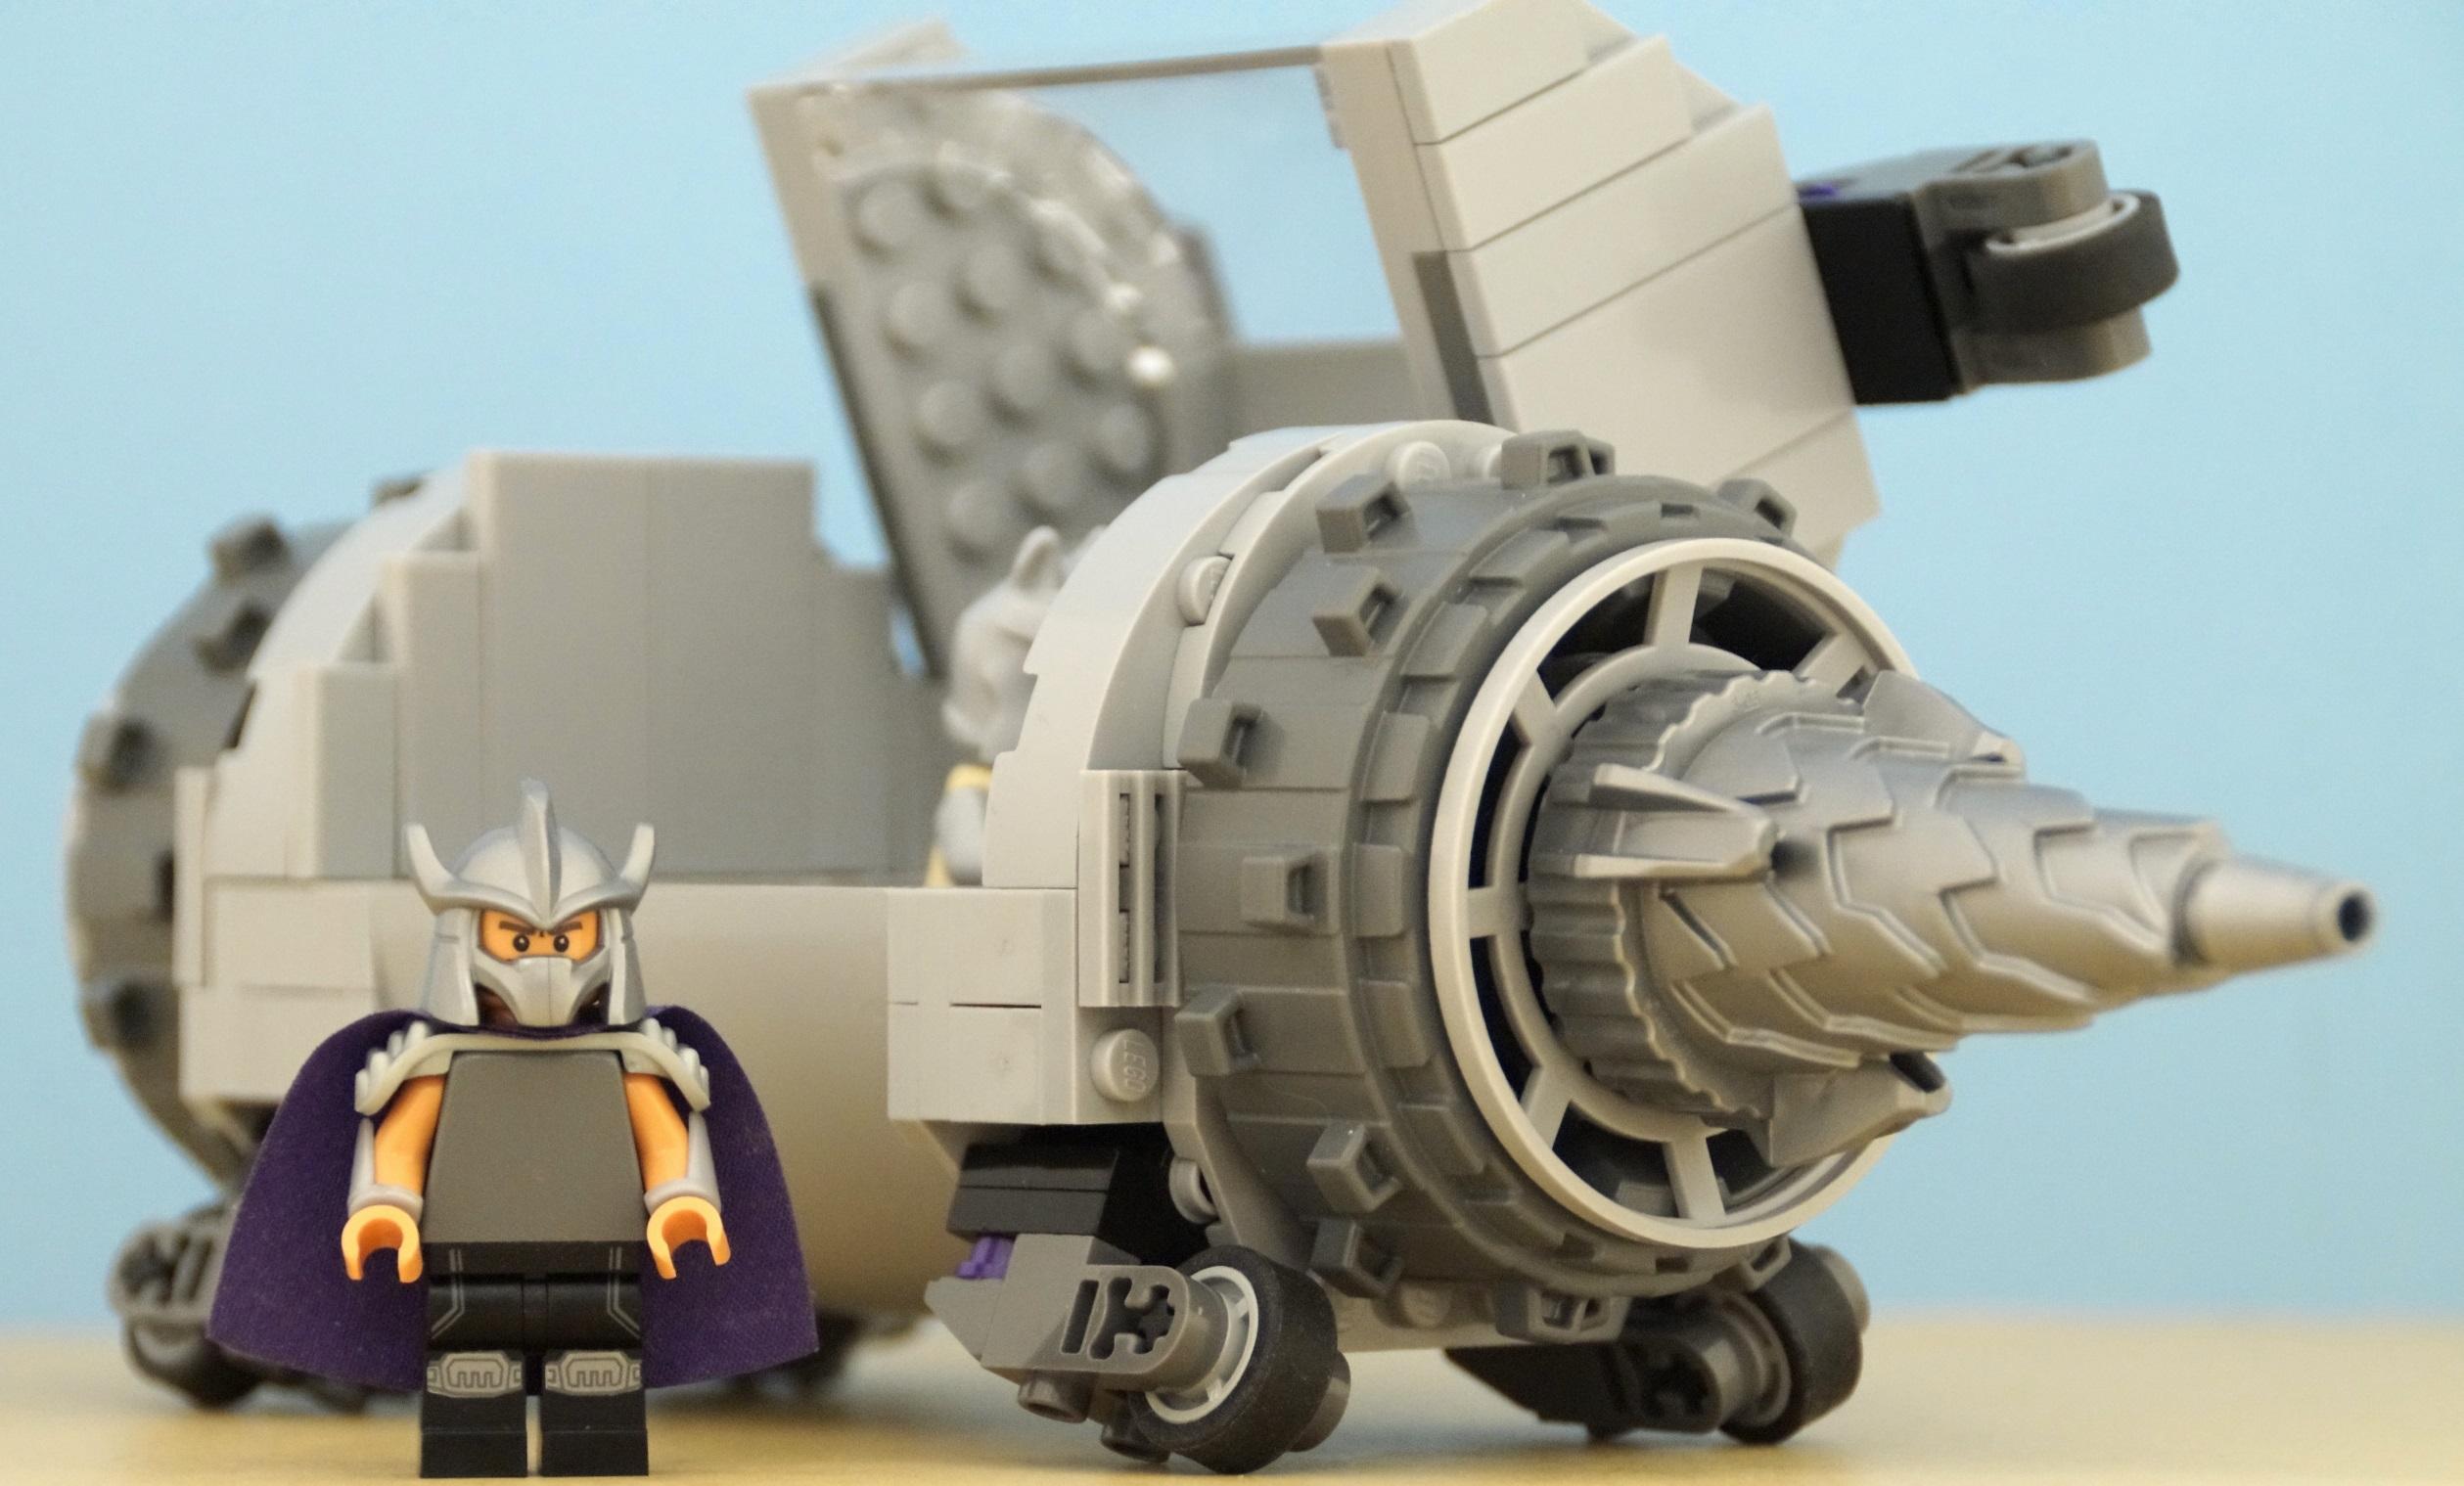 Wallpaper Mainan Ruang Gambar Kartun LEGO Mainan Mesin